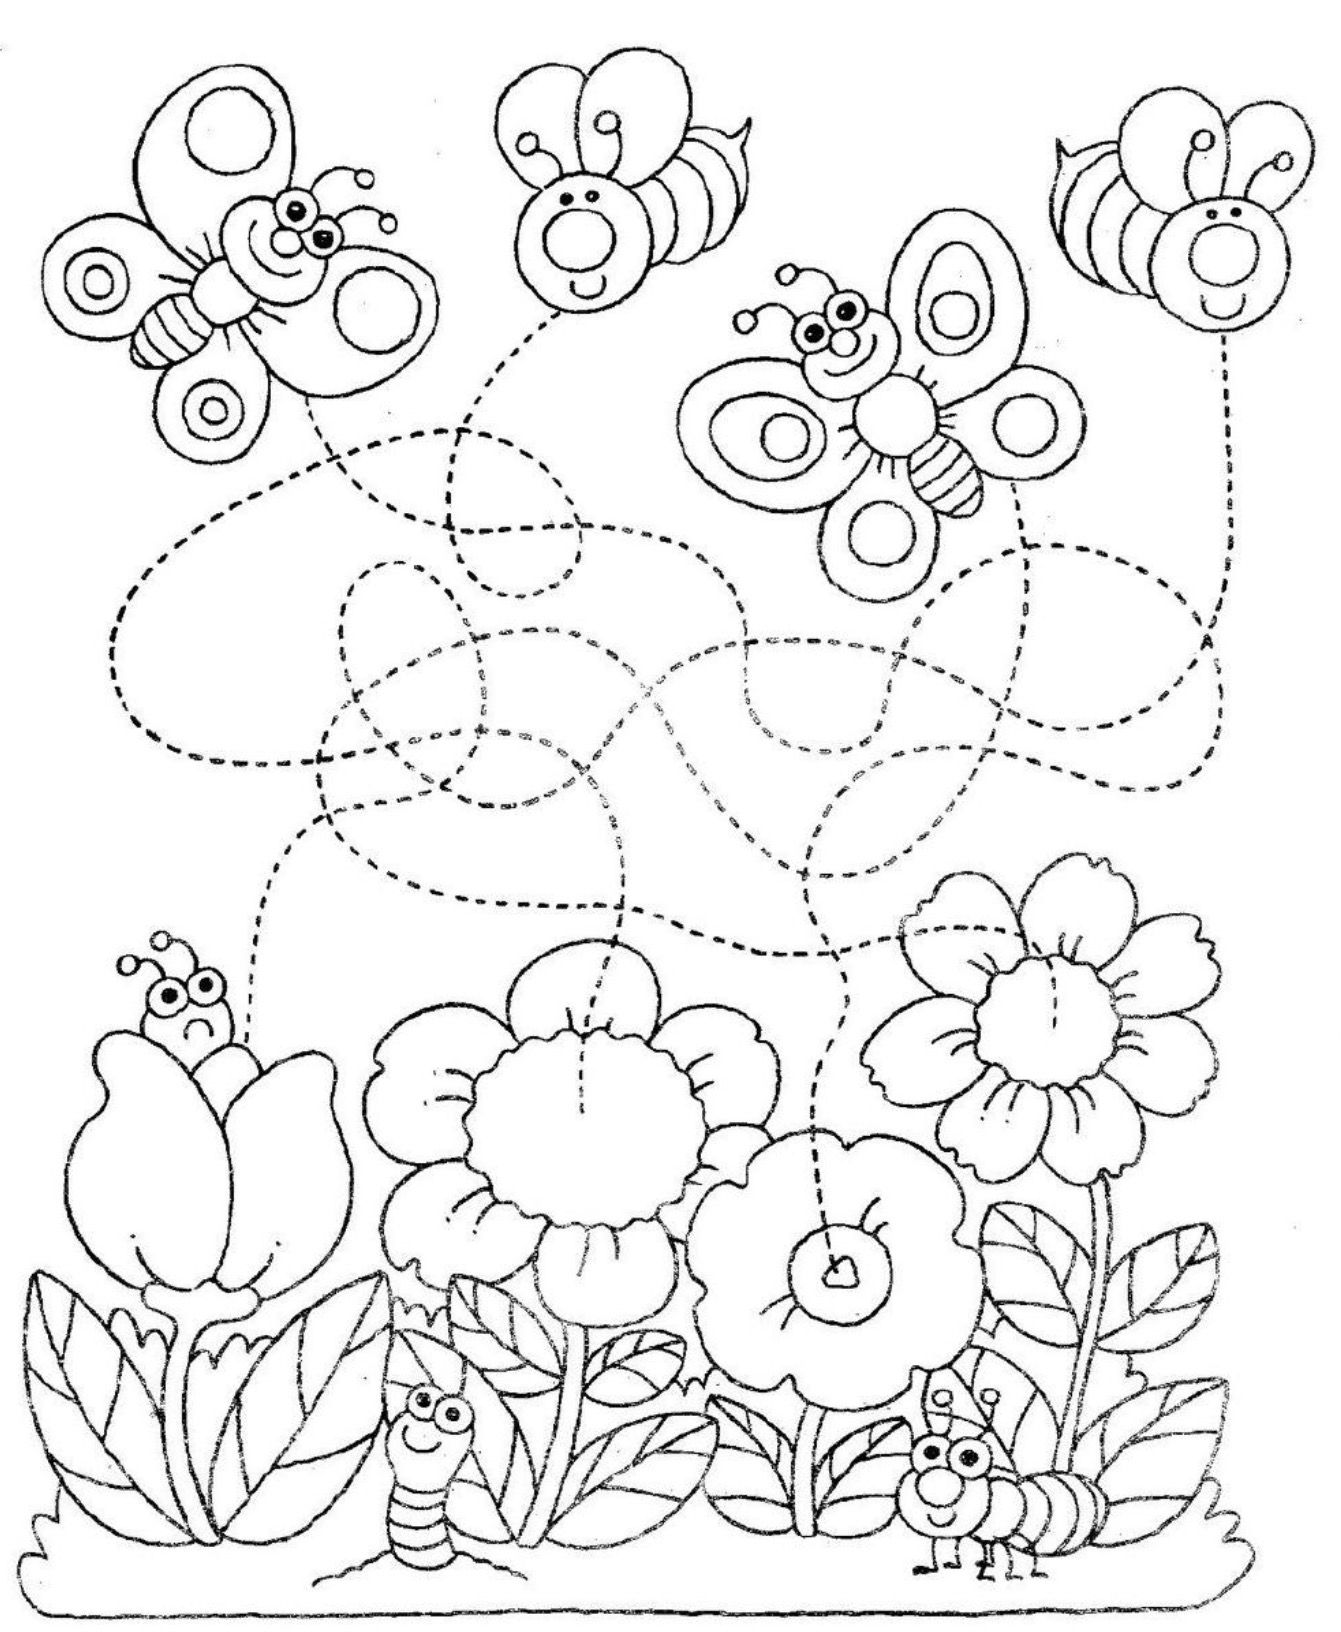 Pin by Doreen Söhmisch on Arbeitsblätter | Pinterest | Kindergarten ...